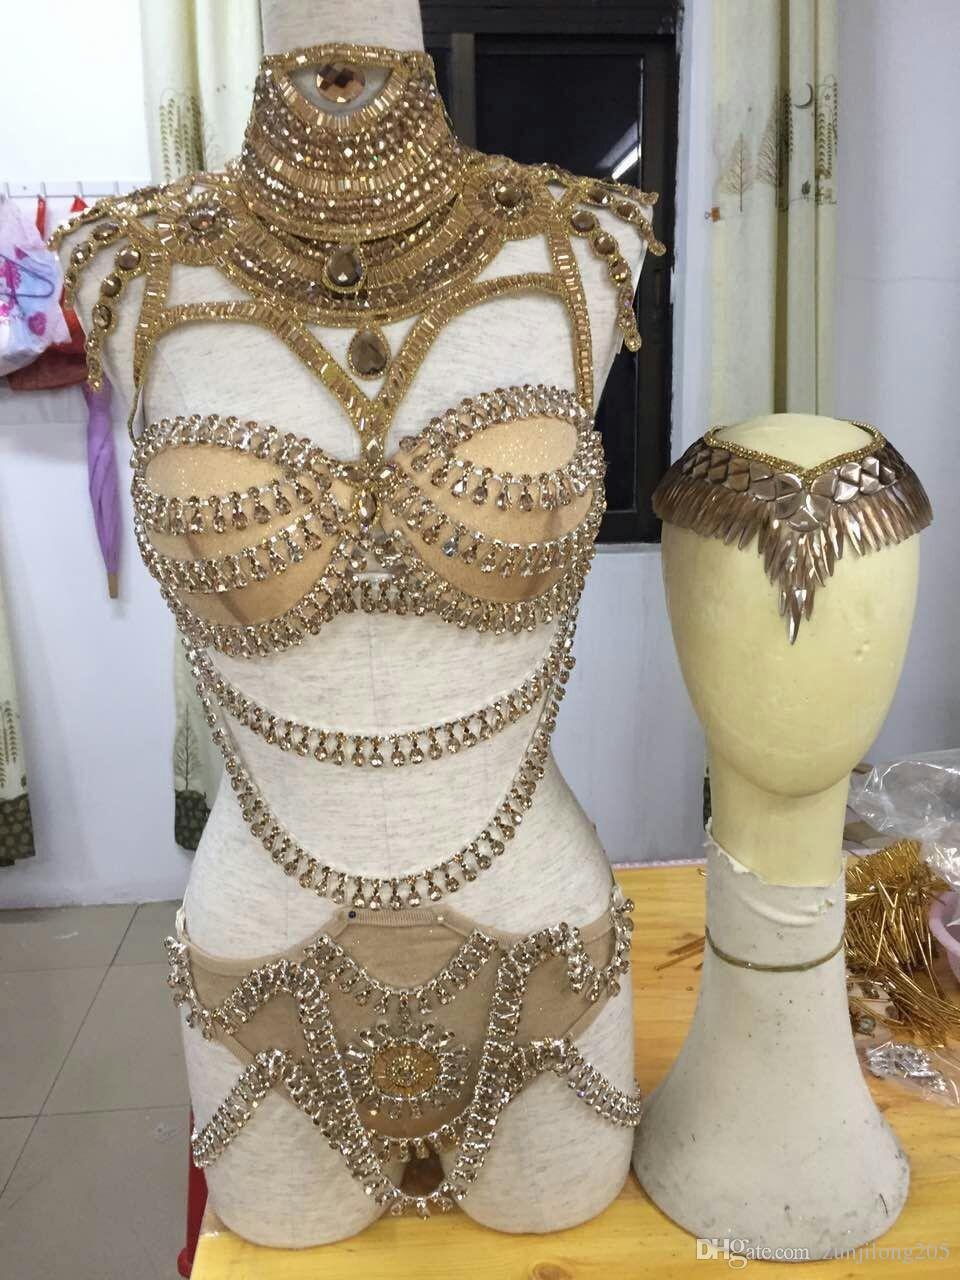 2019 Rhinestone Sequins Body Suits Costumes Women Queen Sexy Gold Bra Short  Clothing Set Female Singer DJ DS Dance Stage Wear From Zunjilong205 e43c2dd518ac